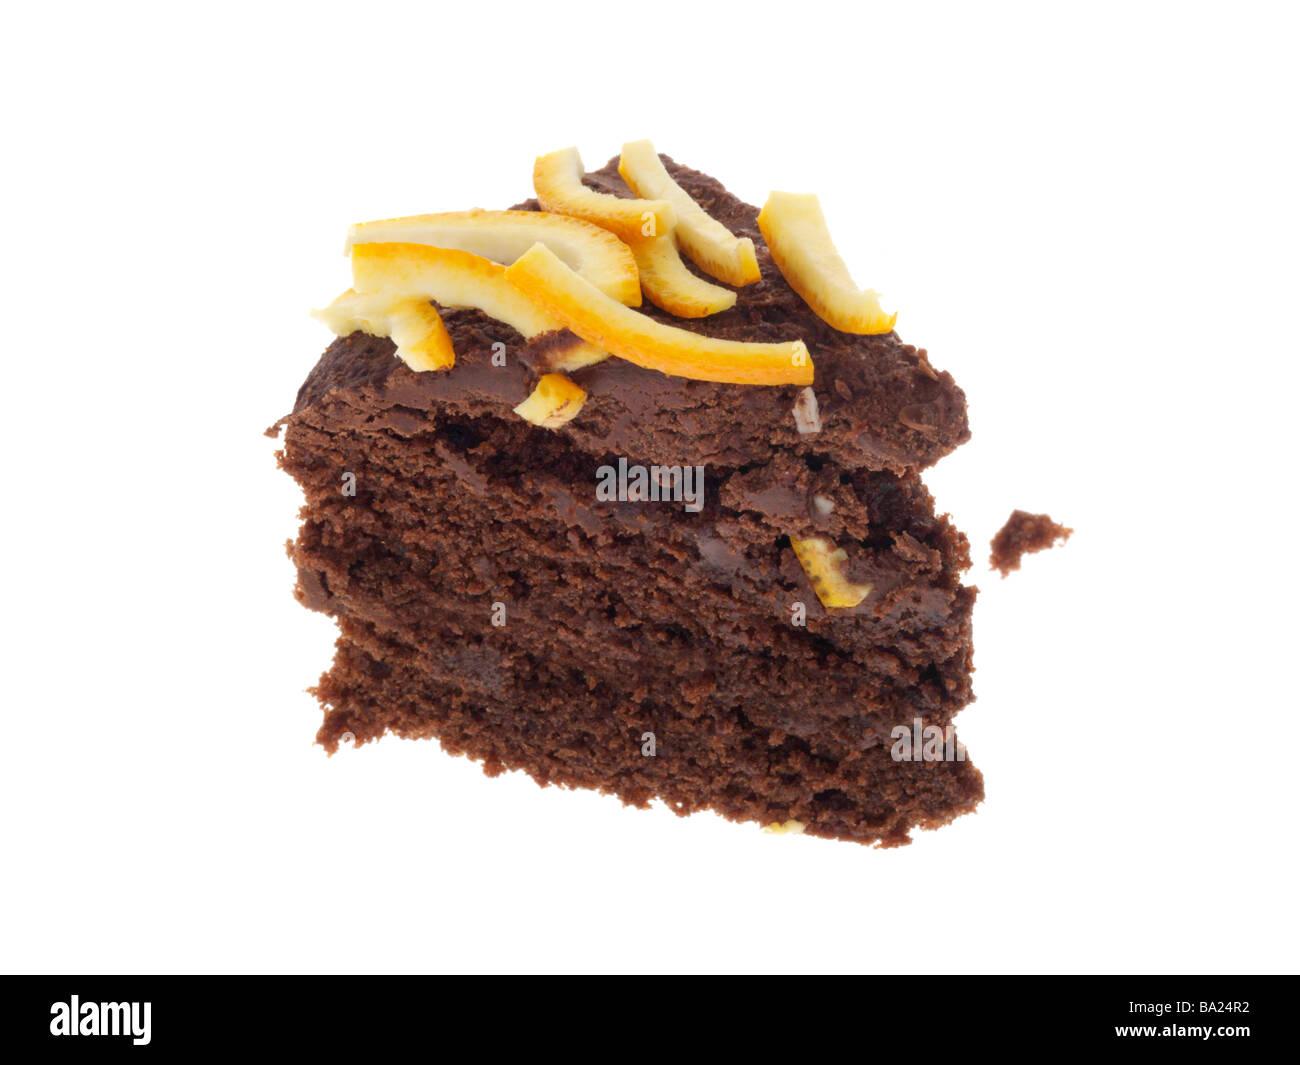 Chocolate Cake with Orange Rind - Stock Image